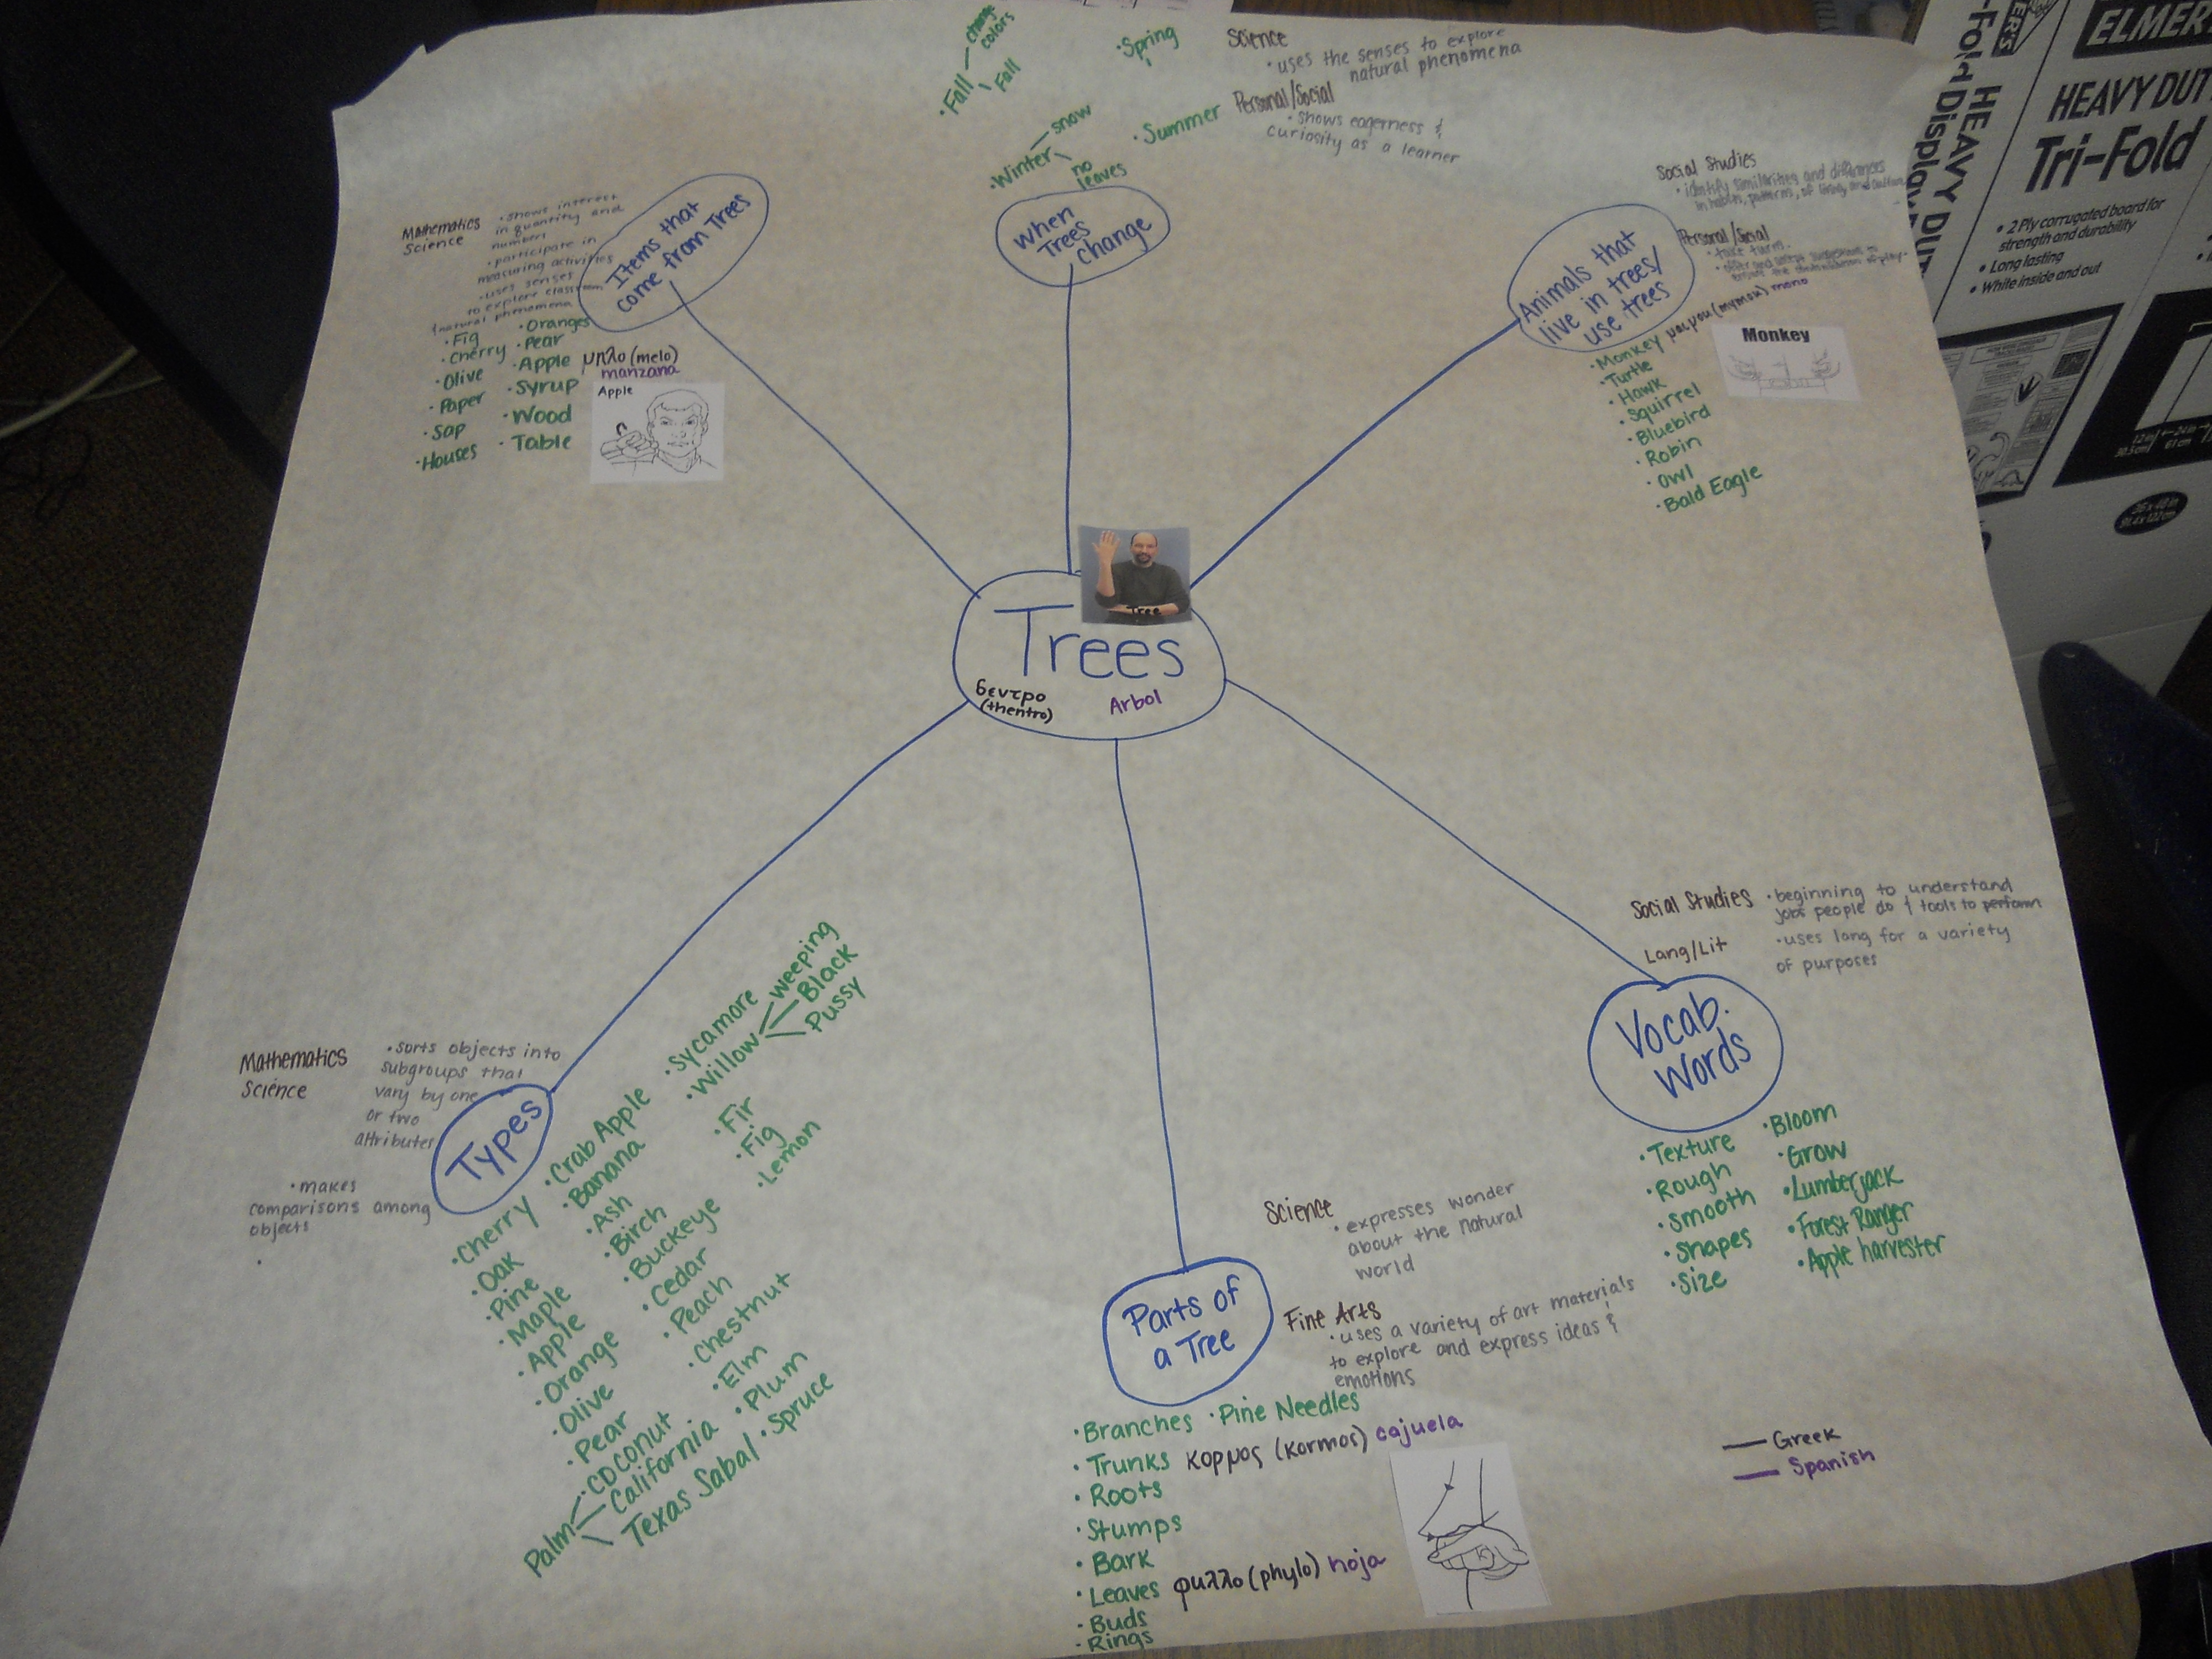 Anticipatory Web